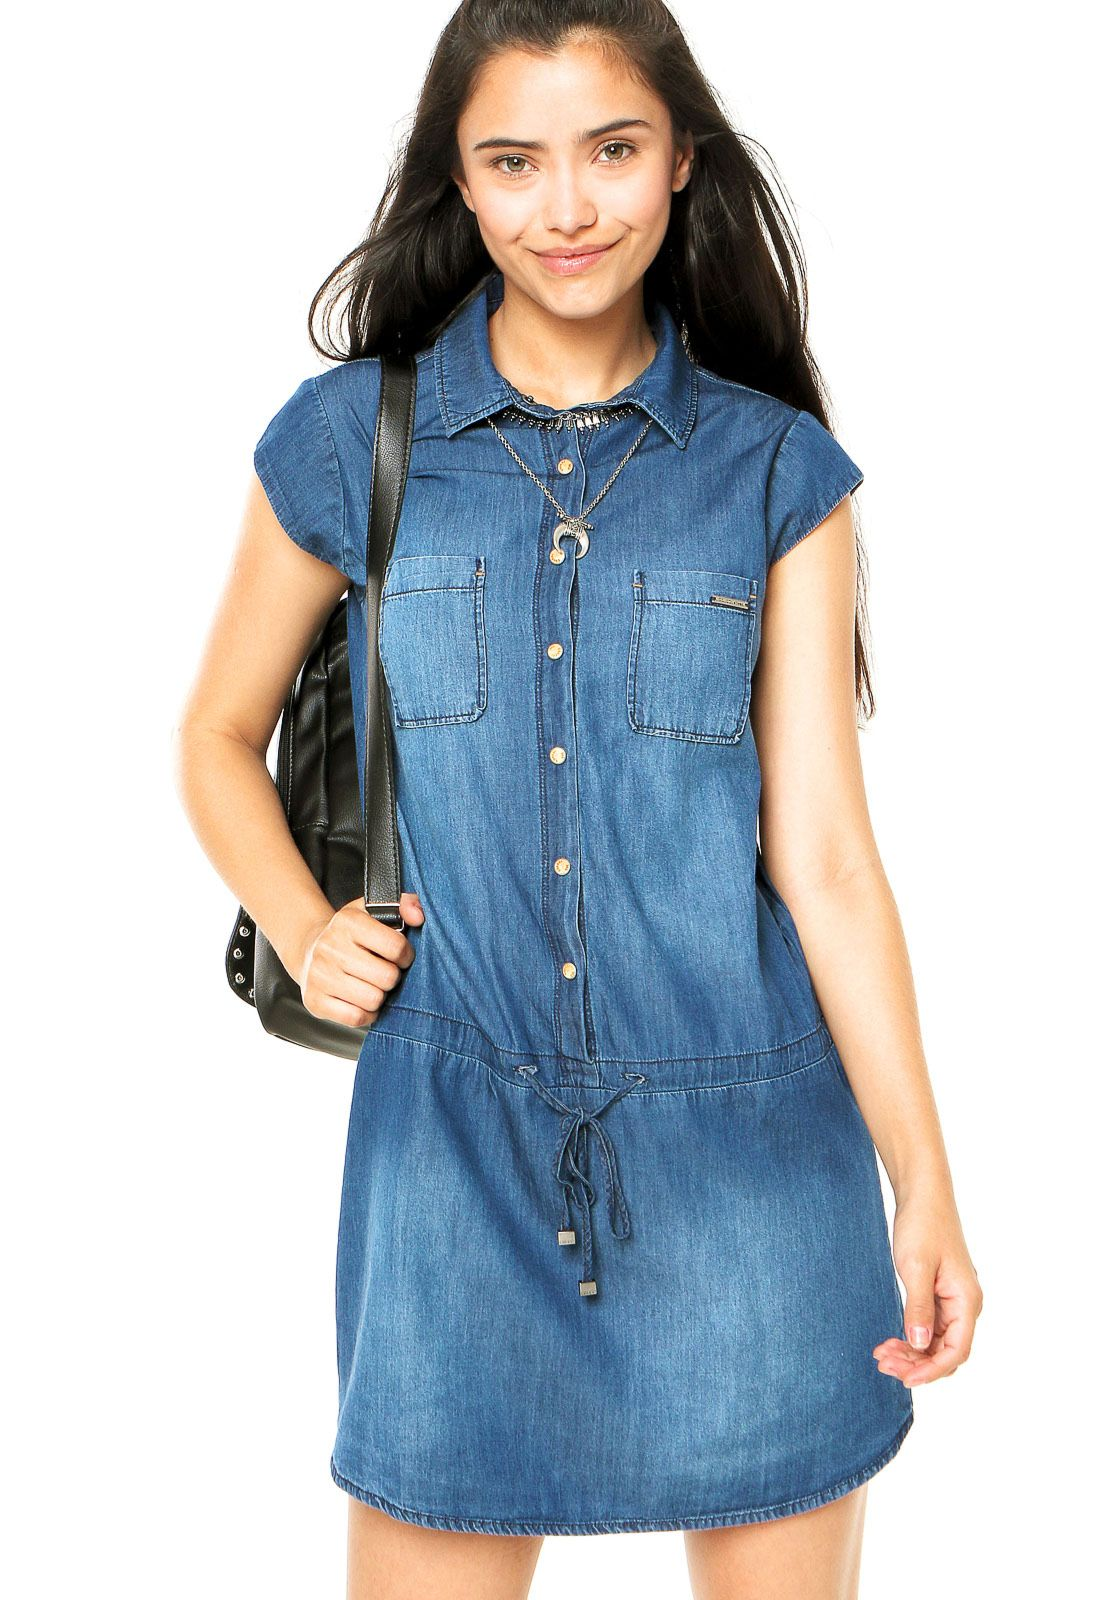 modelo de vestido estilo camisa - Pesquisa Google  046774f959a